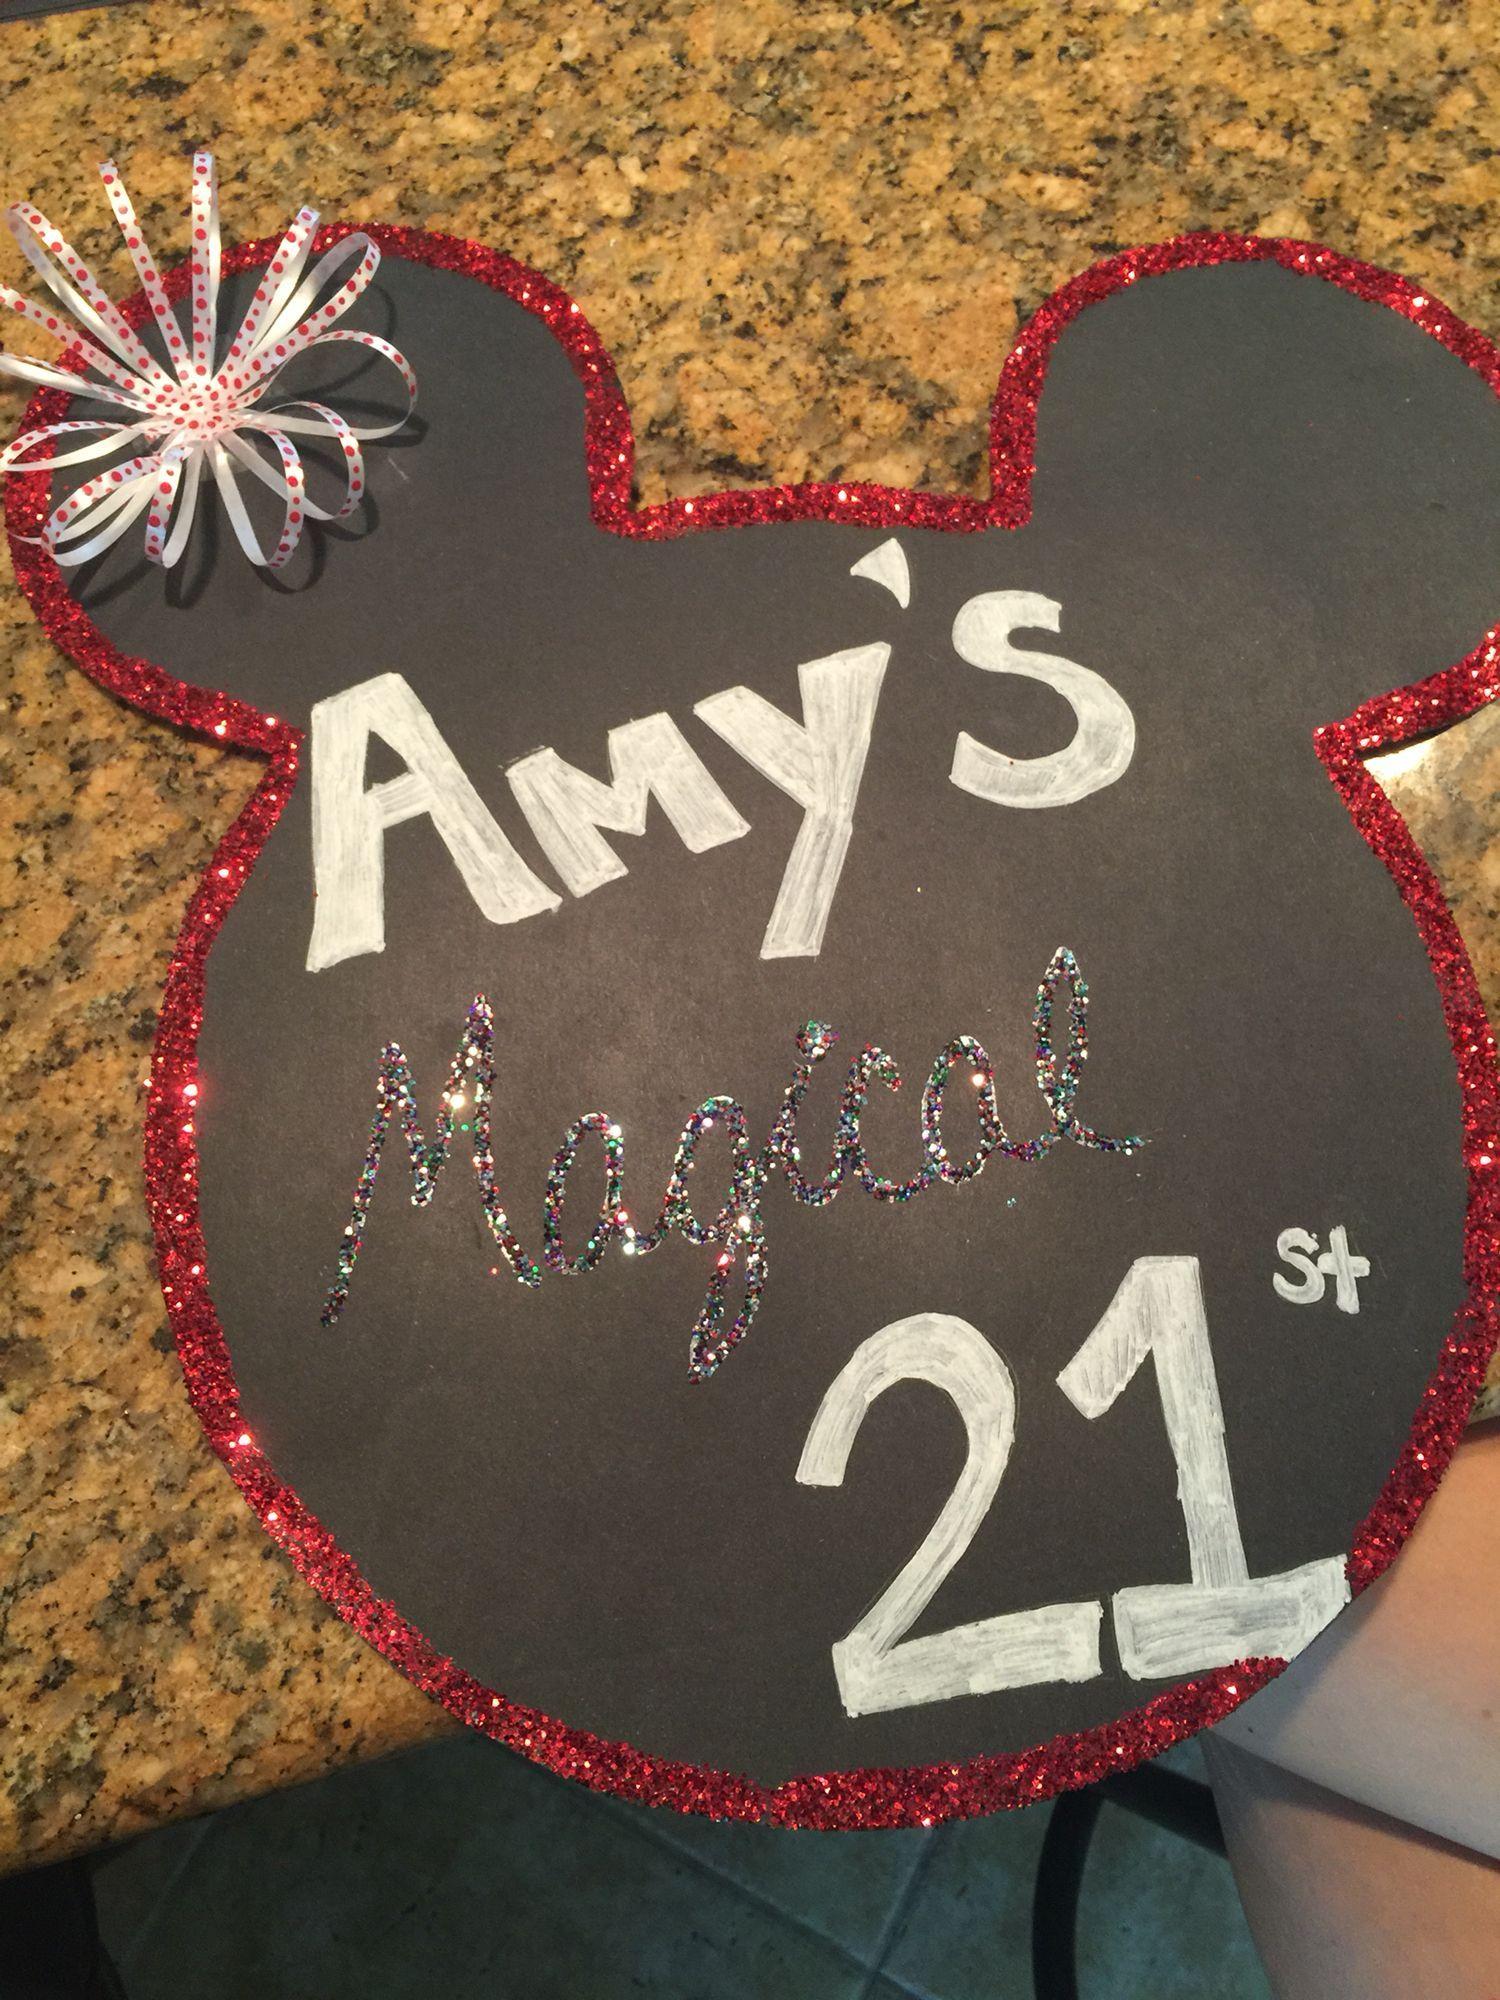 Disney themed 21st birthday sign!! #checklist #birthday #21 #disney #21stbirthdaysigns Disney themed 21st birthday sign!! #checklist #birthday #21 #disney #21stbirthdaysigns